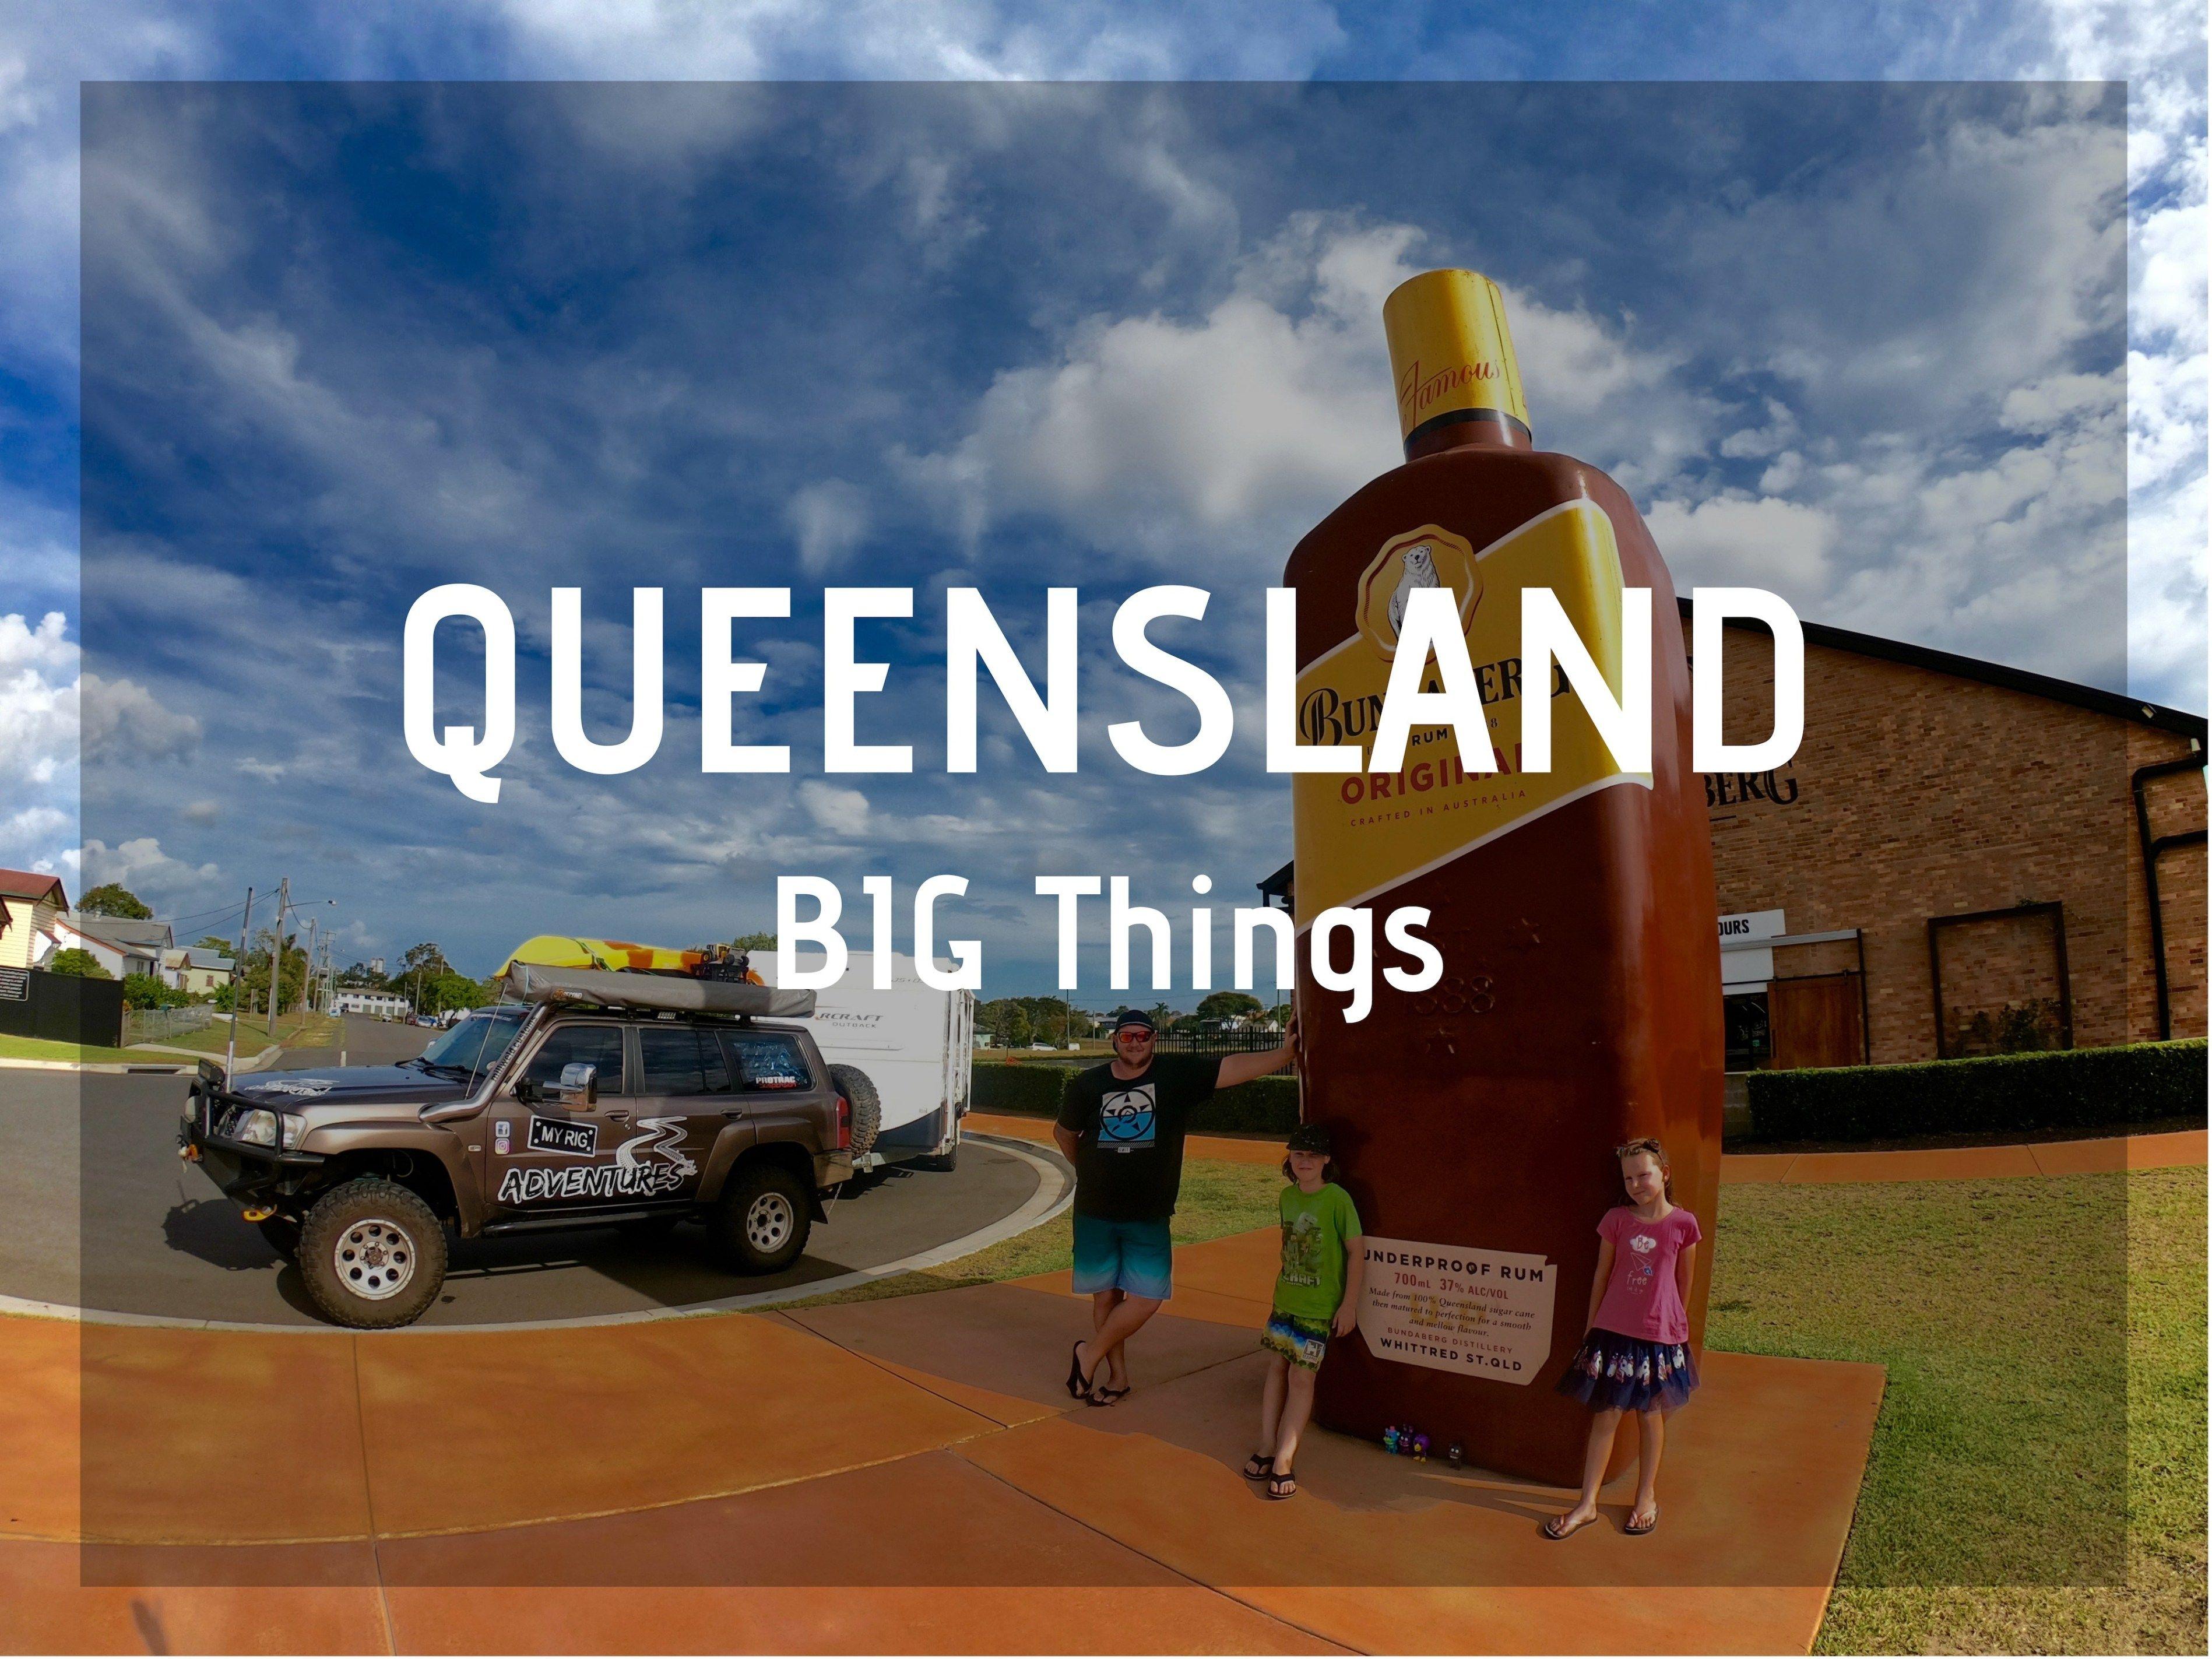 Queensland 'BIG Things' Queensland, Kakadu national park